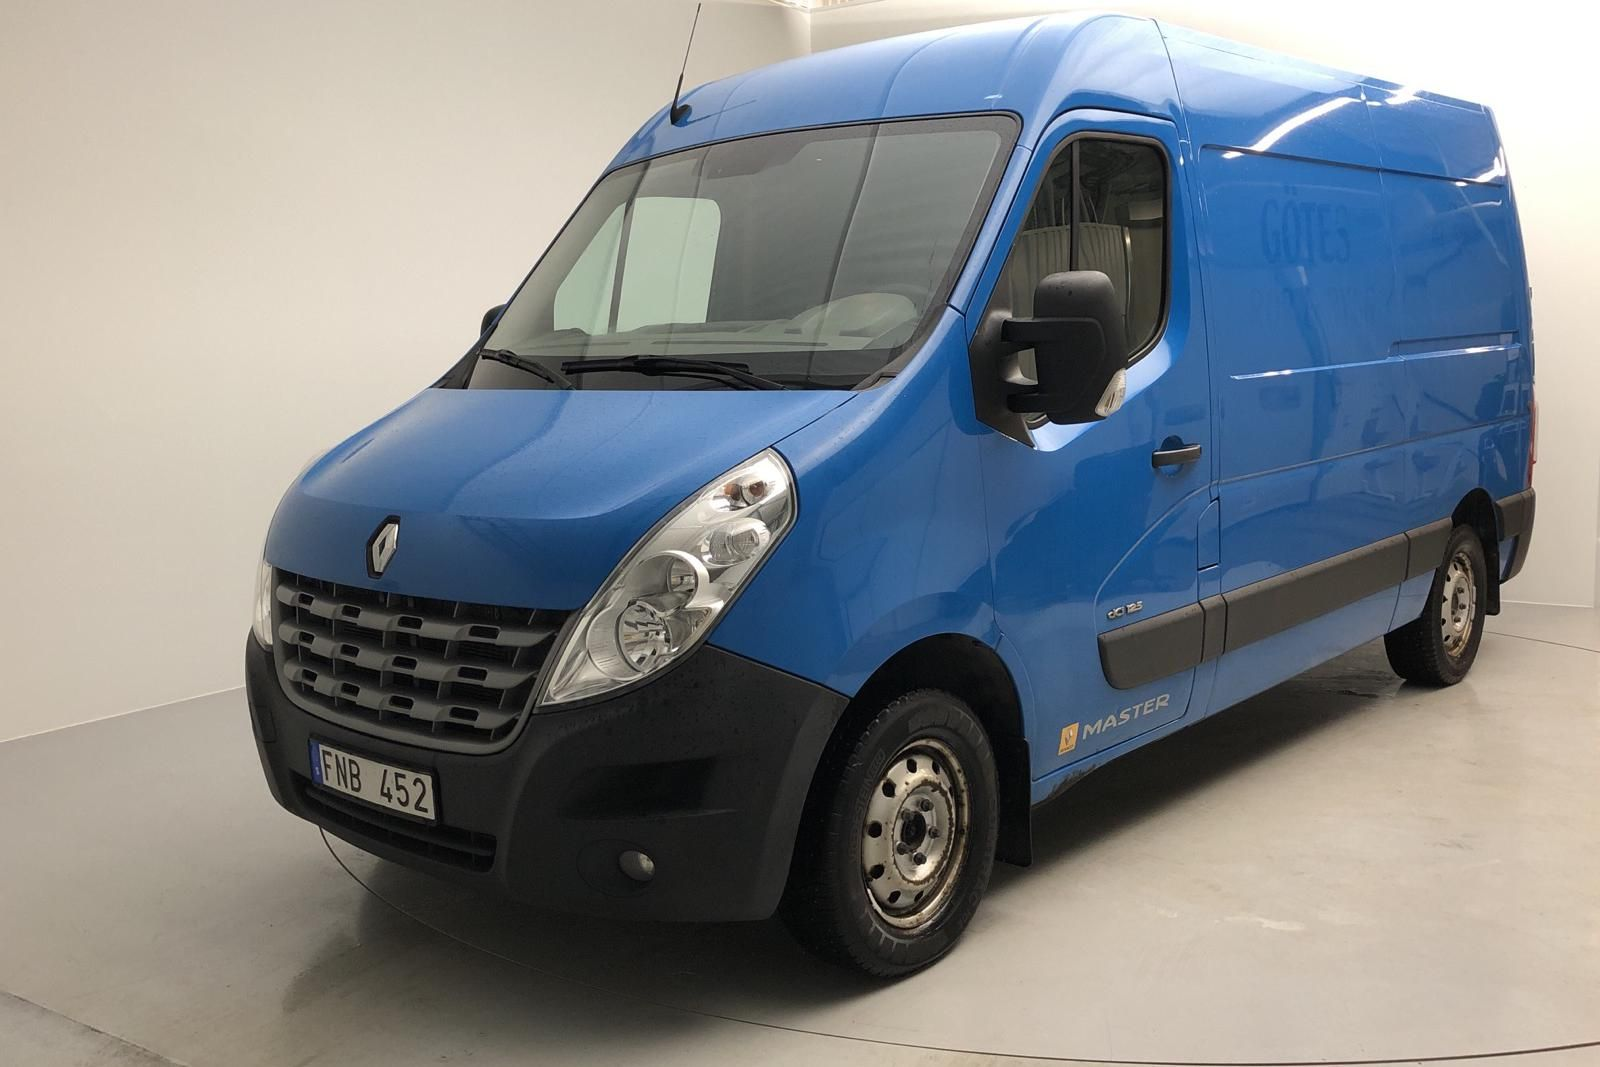 Renault Master 2.3 dCi FAP 2WD (125 hk)